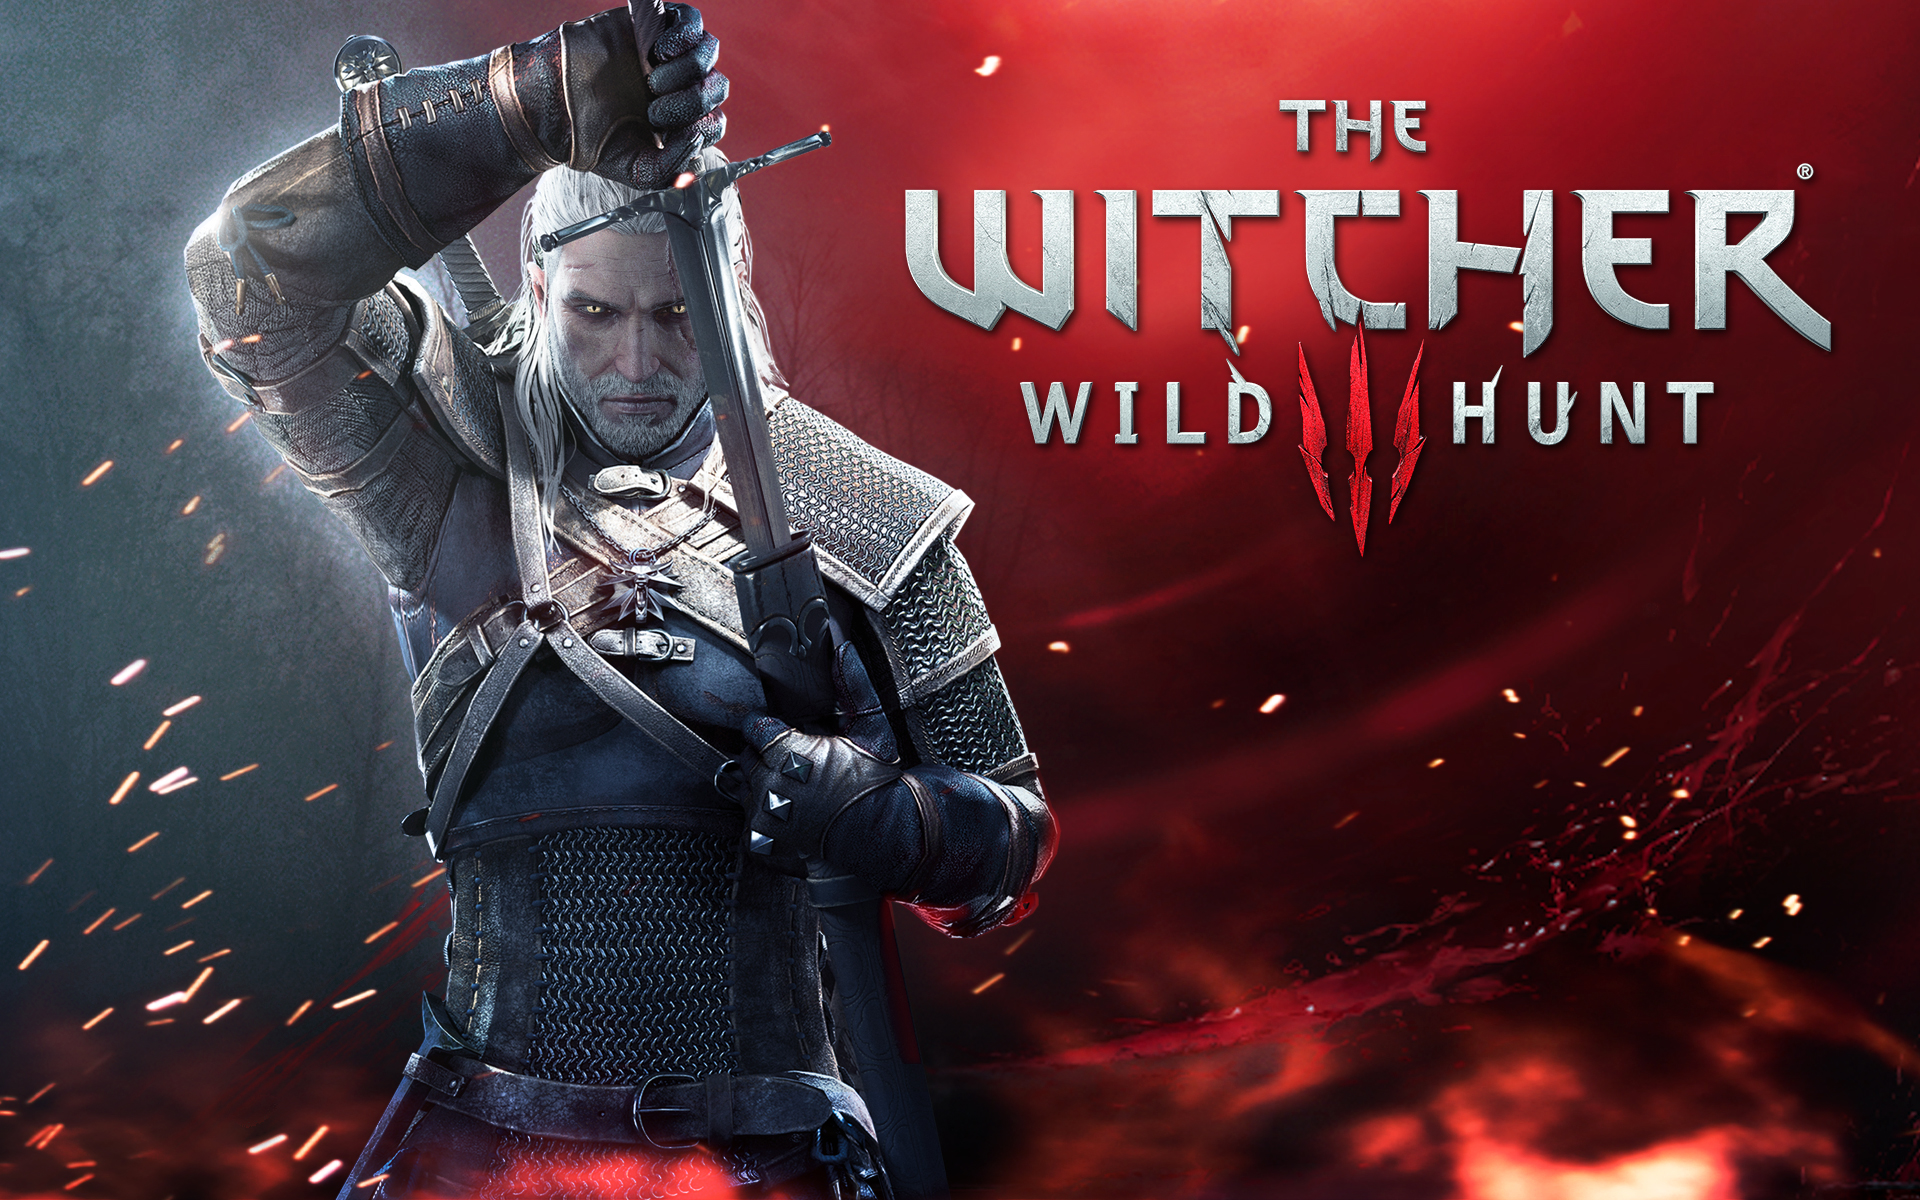 The Witcher 3 Wild Hunt, обои - Witcher 3: Wild Hunt, the The Witcher 3 Wild Hunt обои, The Witcher 3 Wild Hunt, обои